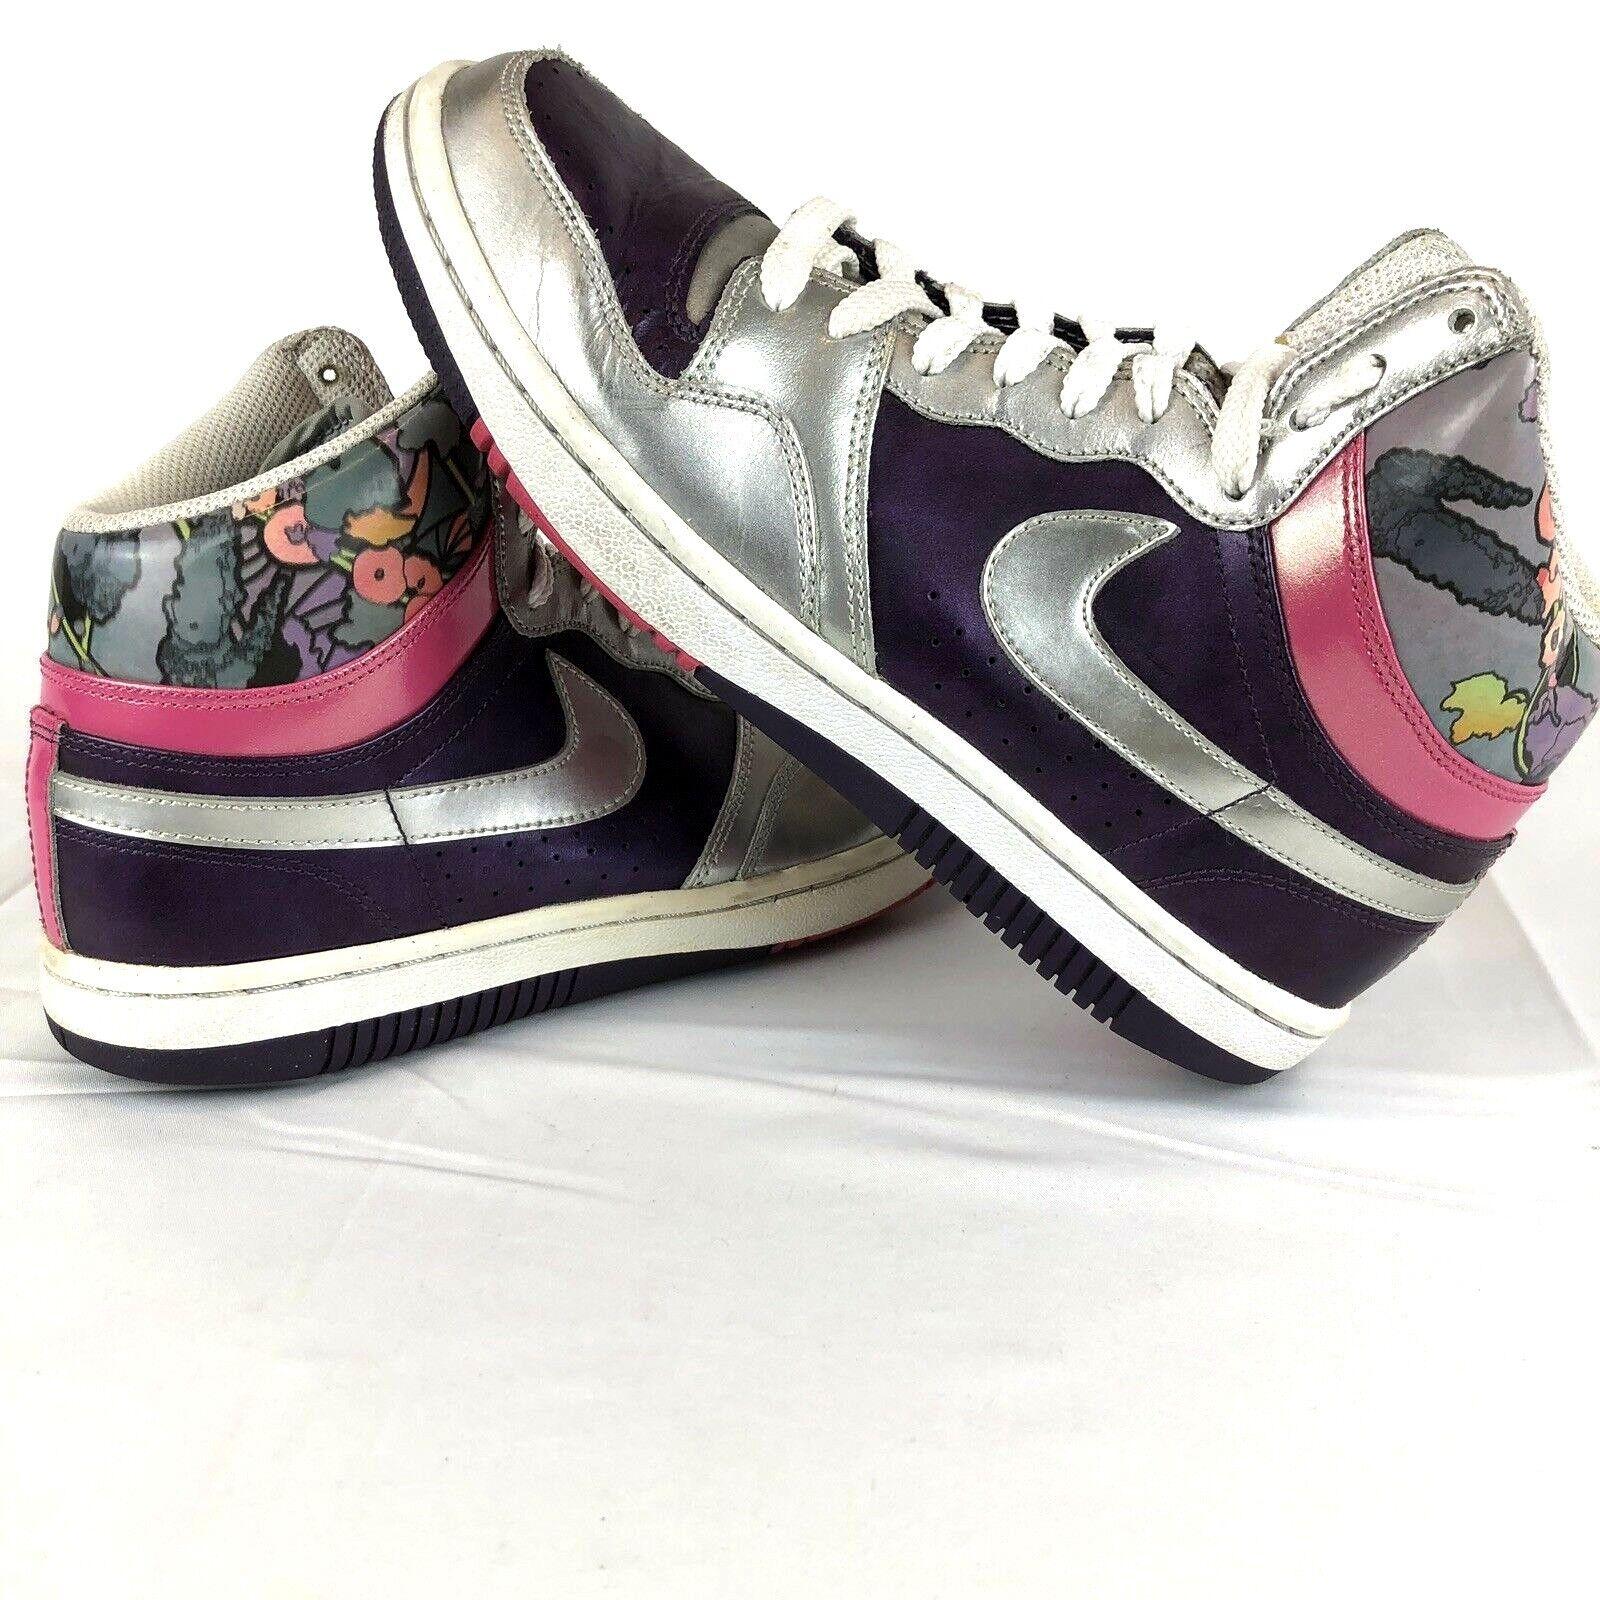 Nike Court Force Women's Size 9 Hi Top Silver Purple Pink shoes Rare 316117-501